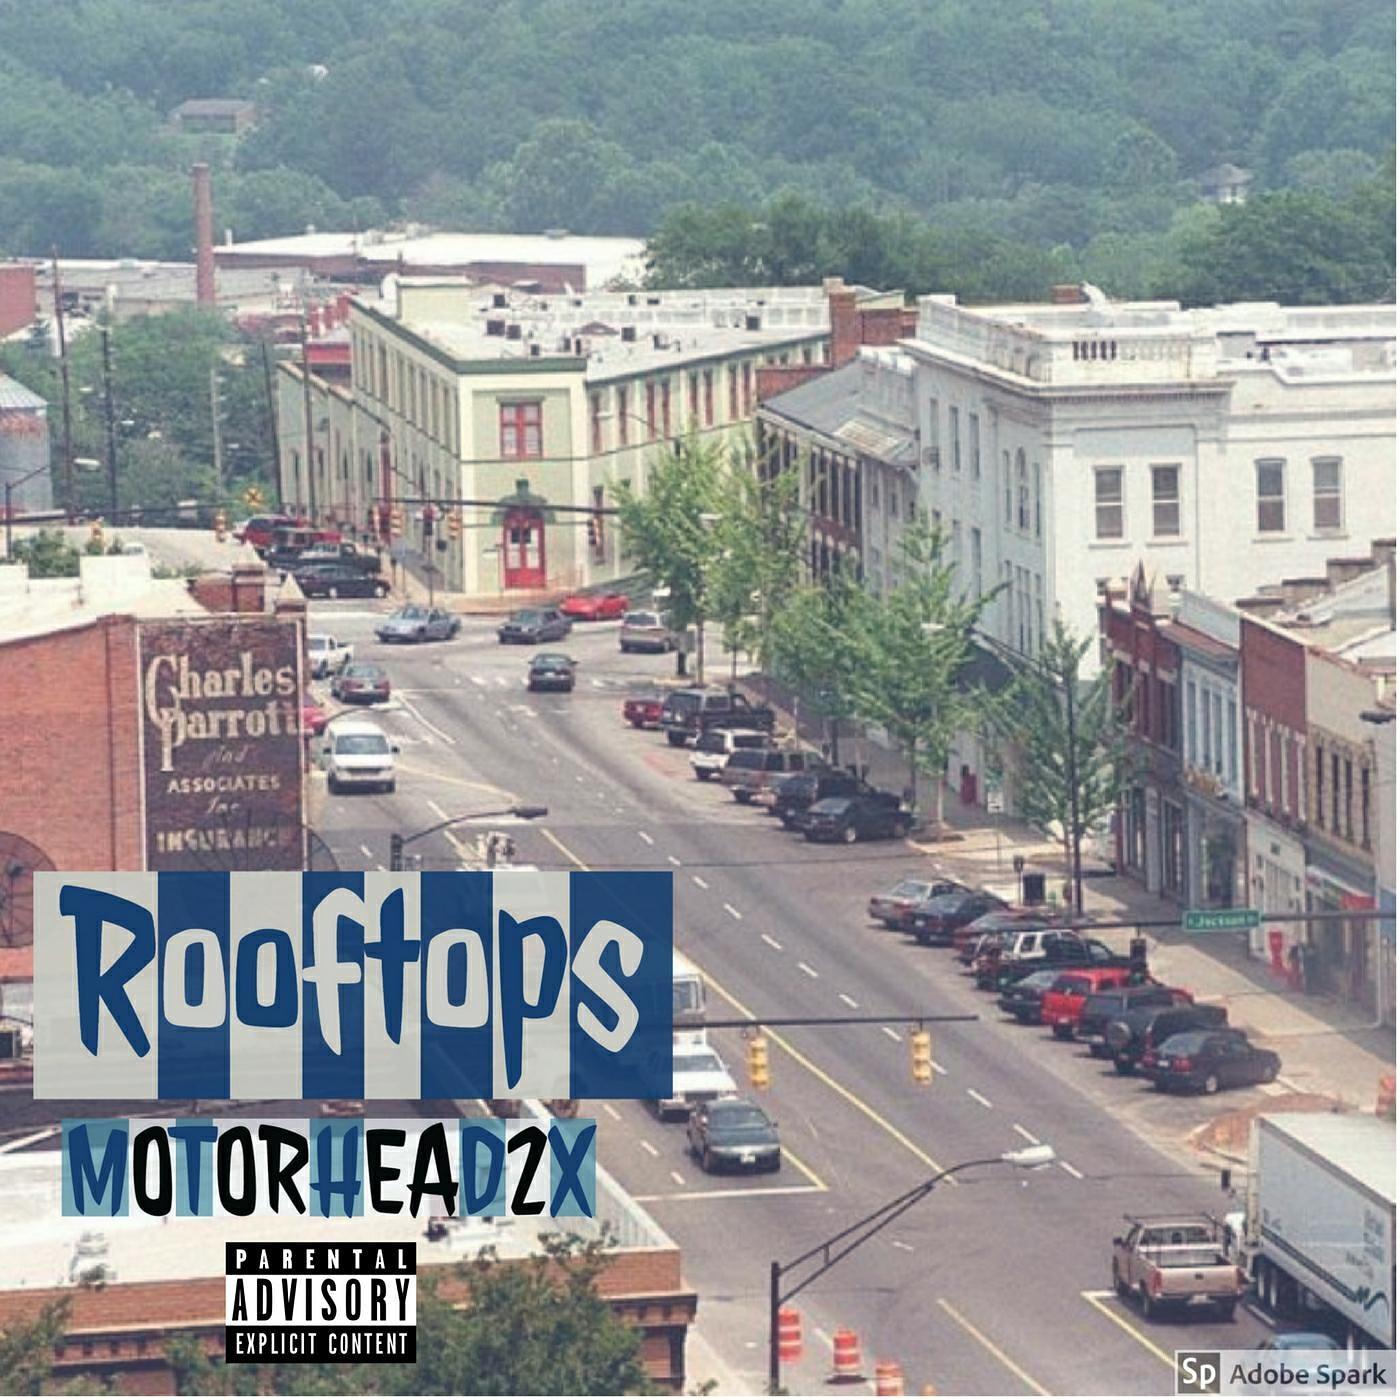 Rooftops - Motorhead2x